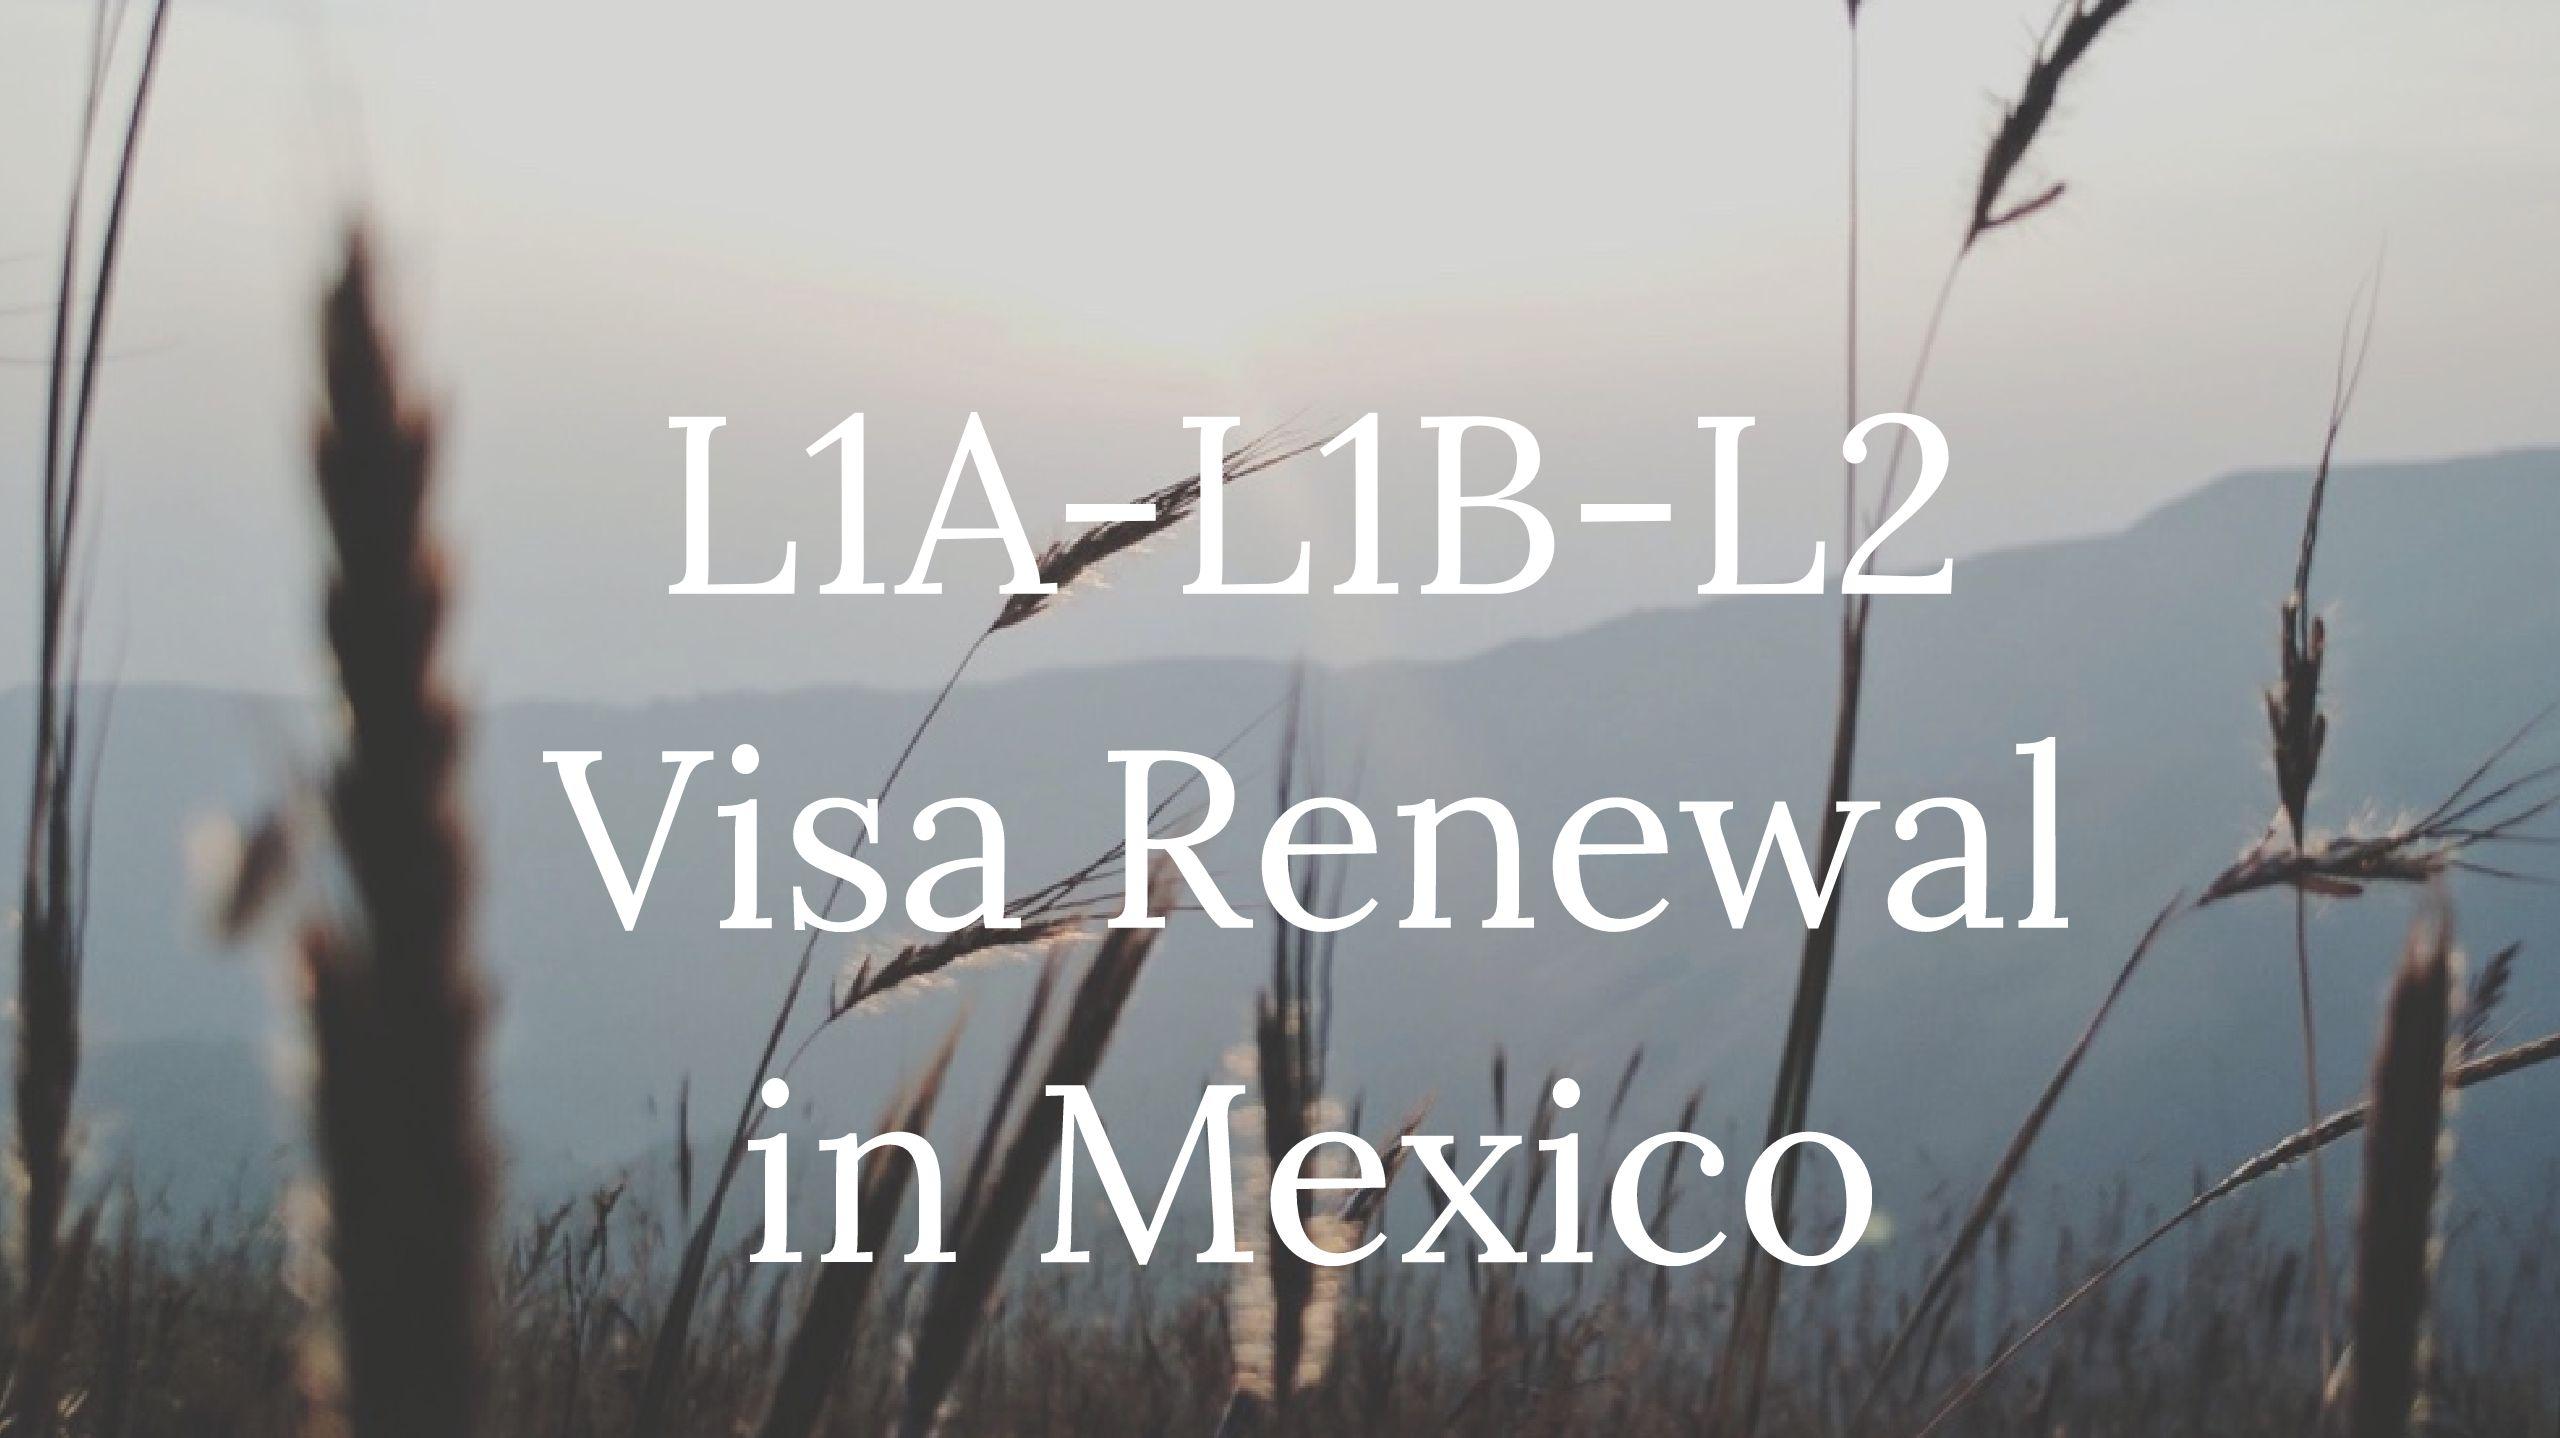 L1A - L1B - L2 Visa Renewal Interview Stamping in Mexico